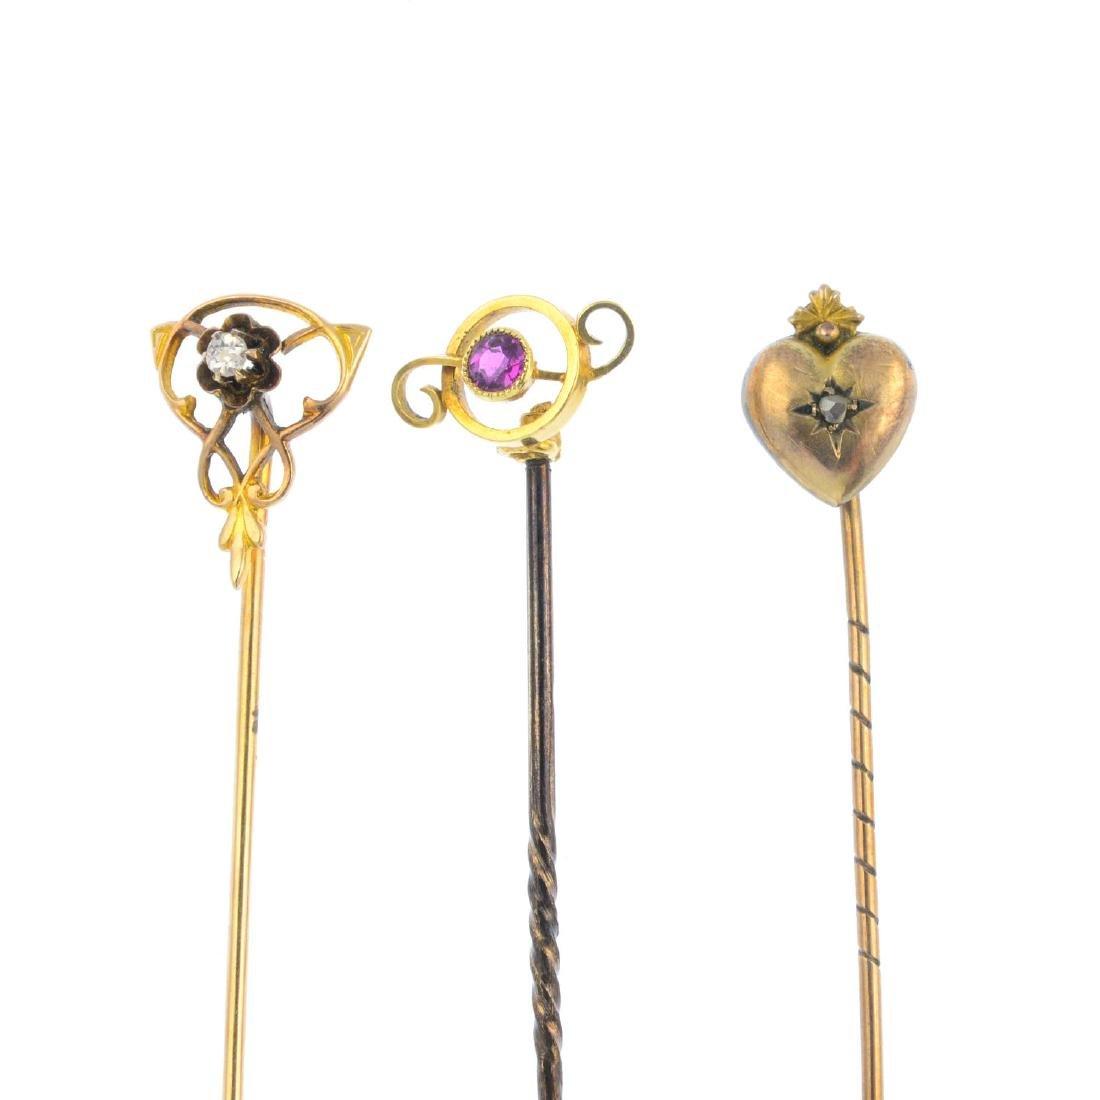 Three early 20th century gem-set stickpins. Designs to